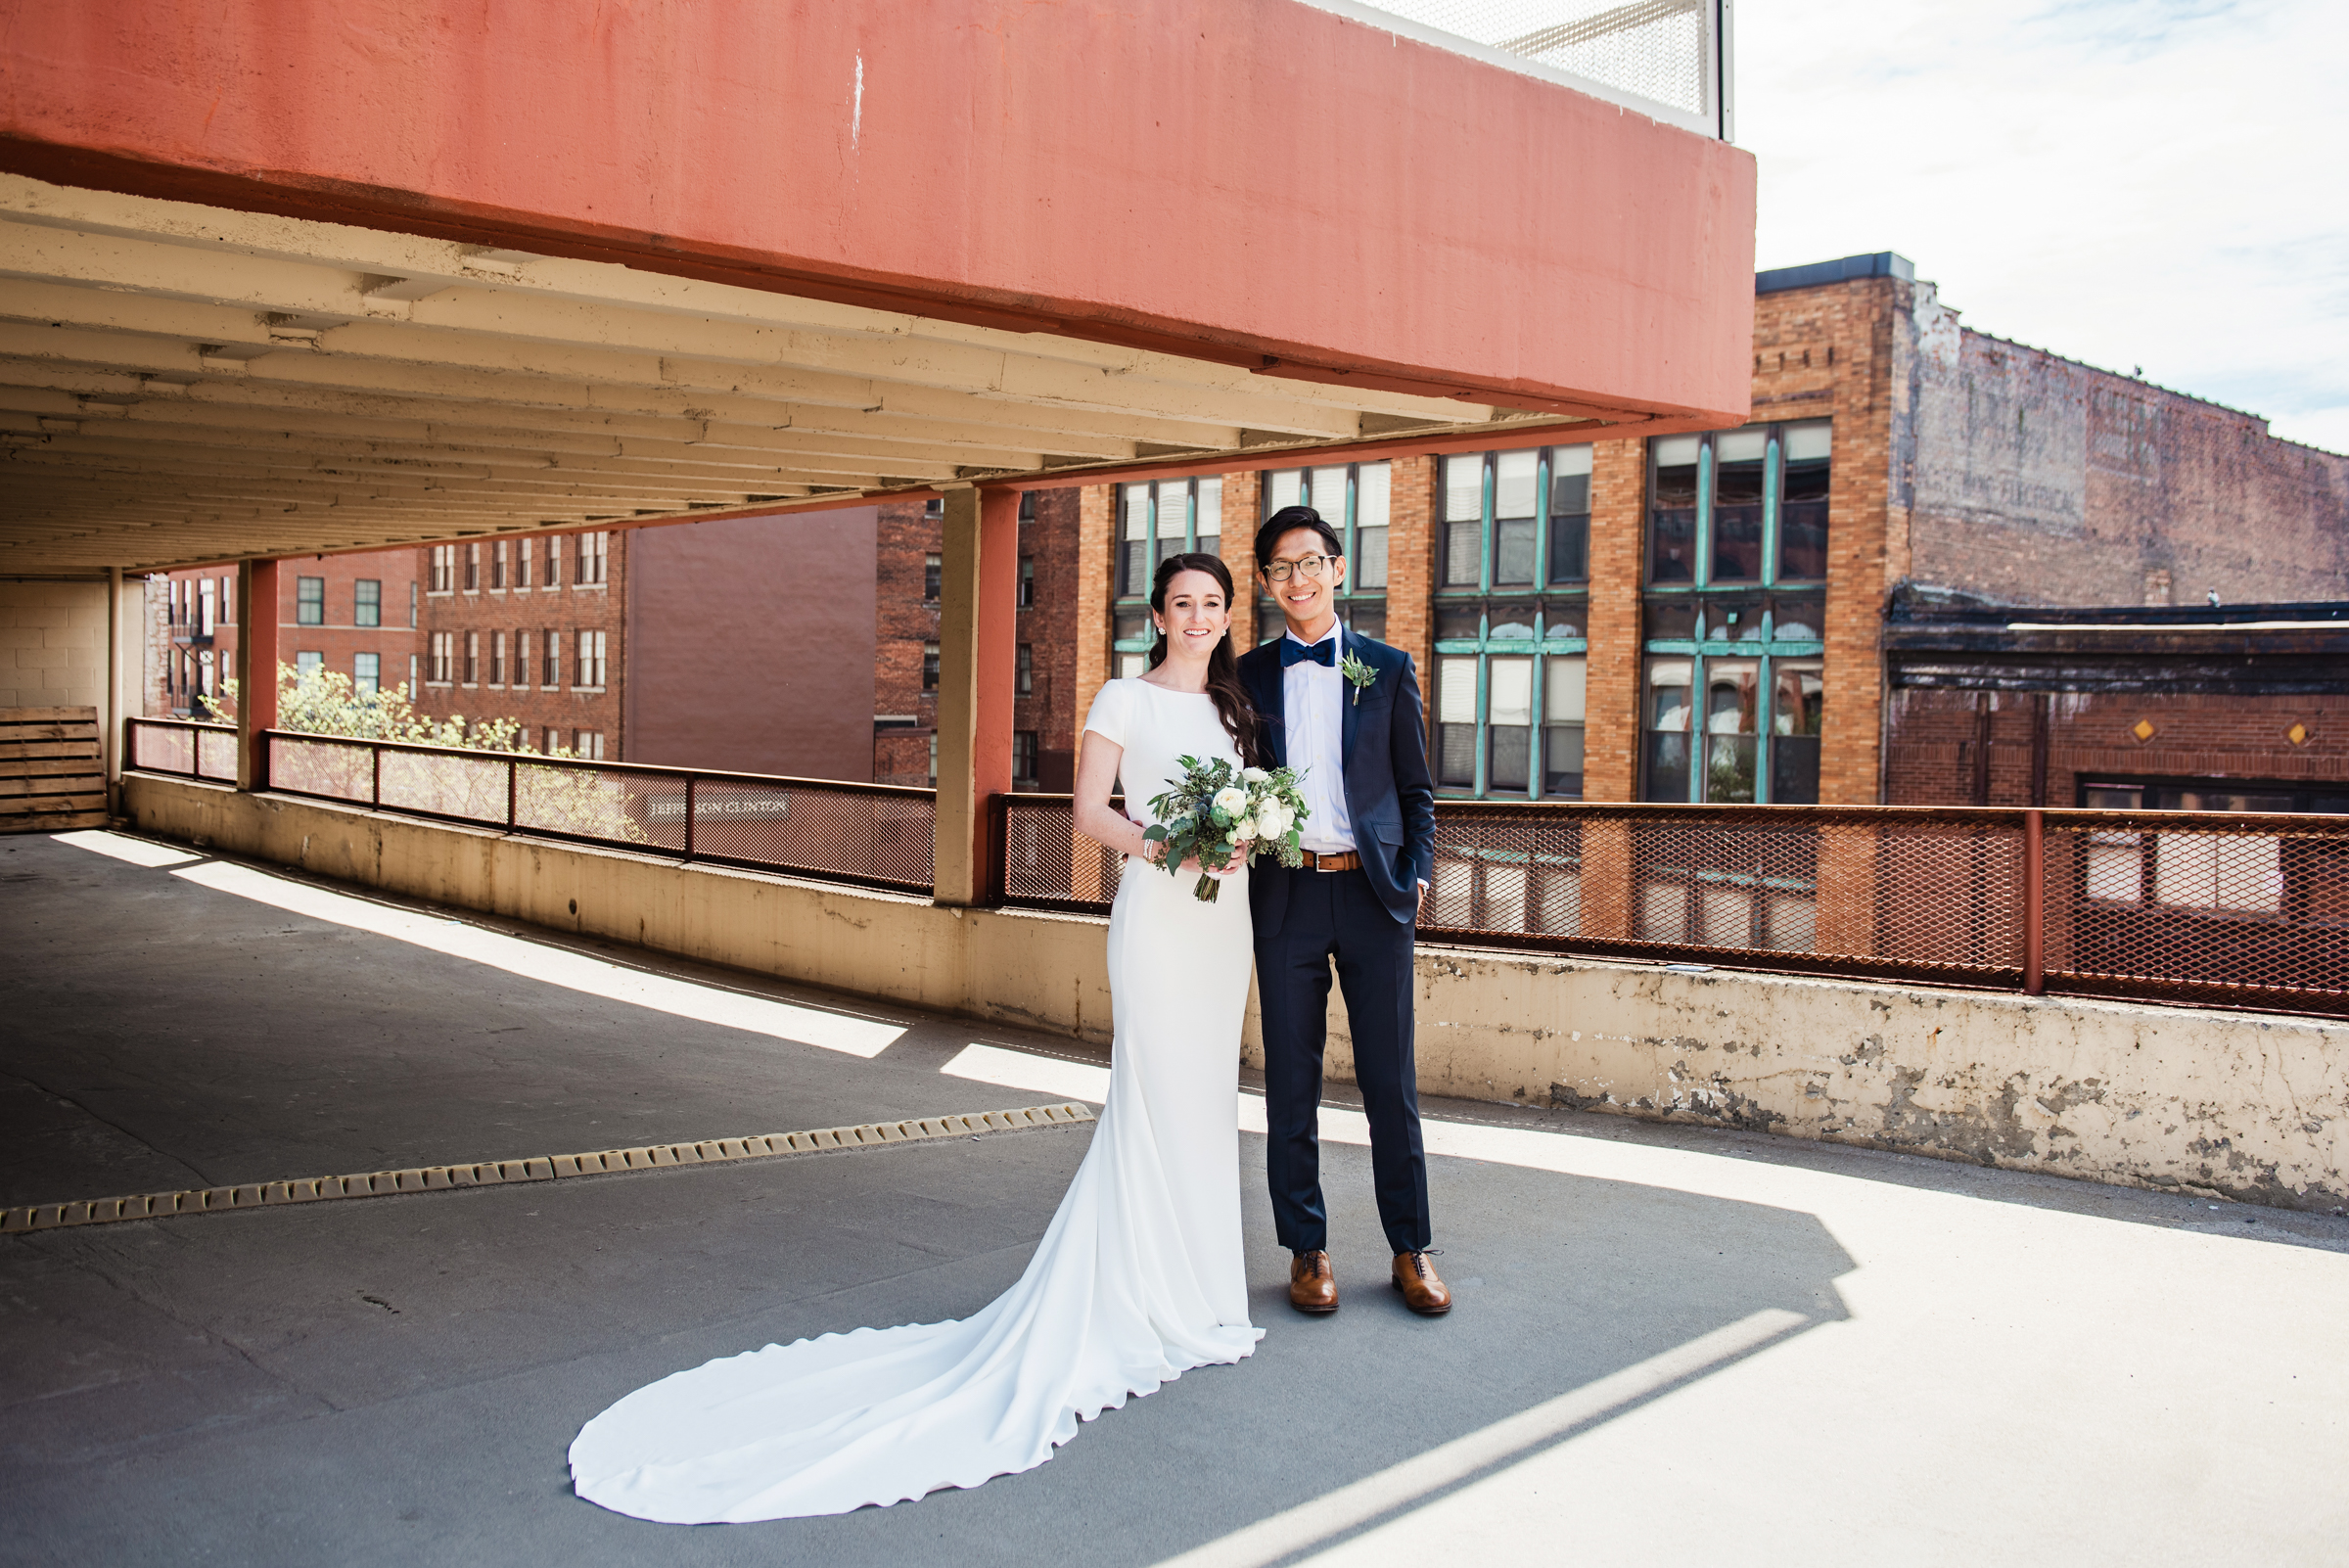 SKY_Armory_Syracuse_Wedding_JILL_STUDIO_Rochester_NY_Photographer_DSC_5226.jpg